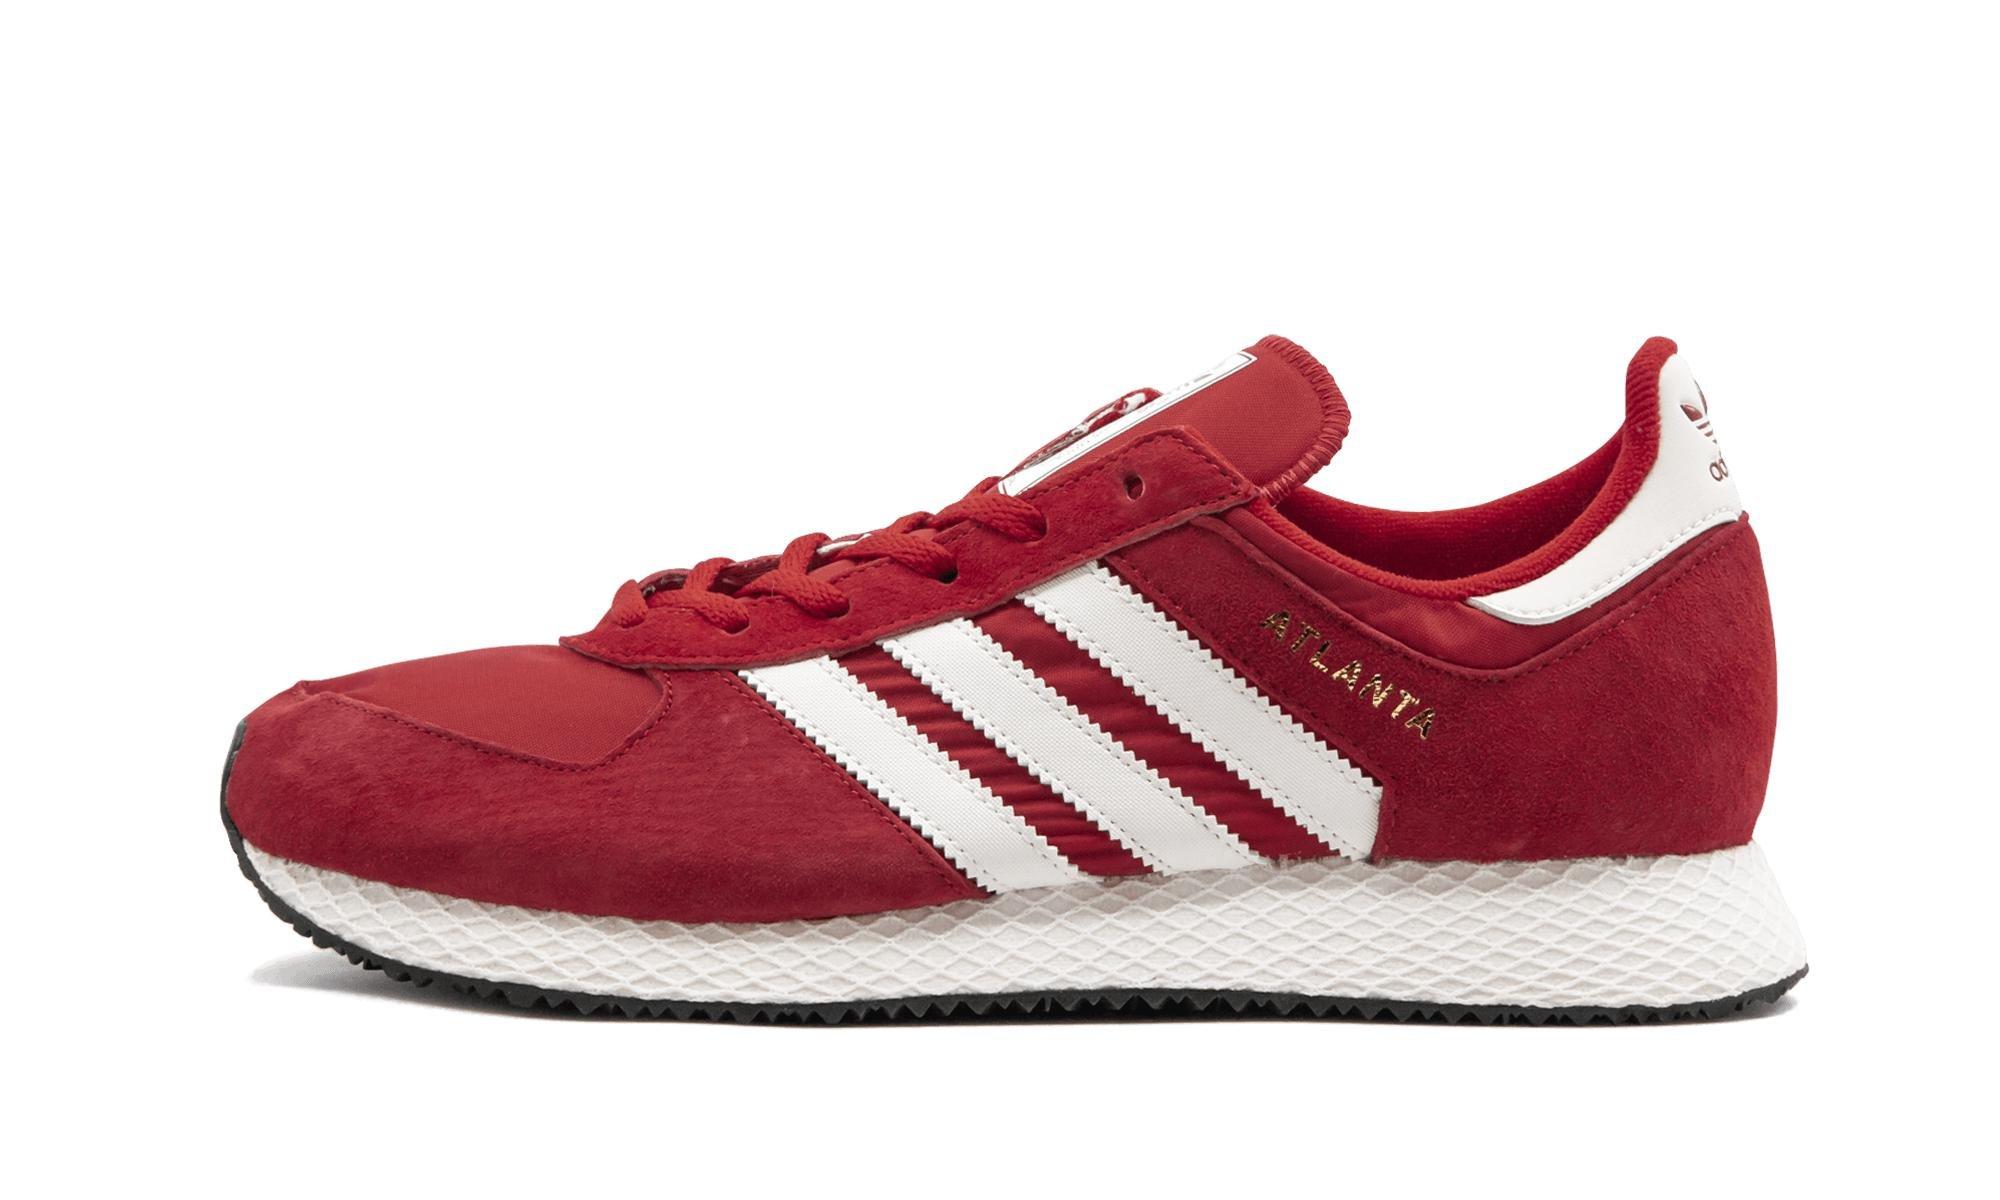 uk availability 14c4d a4c73 adidas. Mens Red Atlanta Spzl